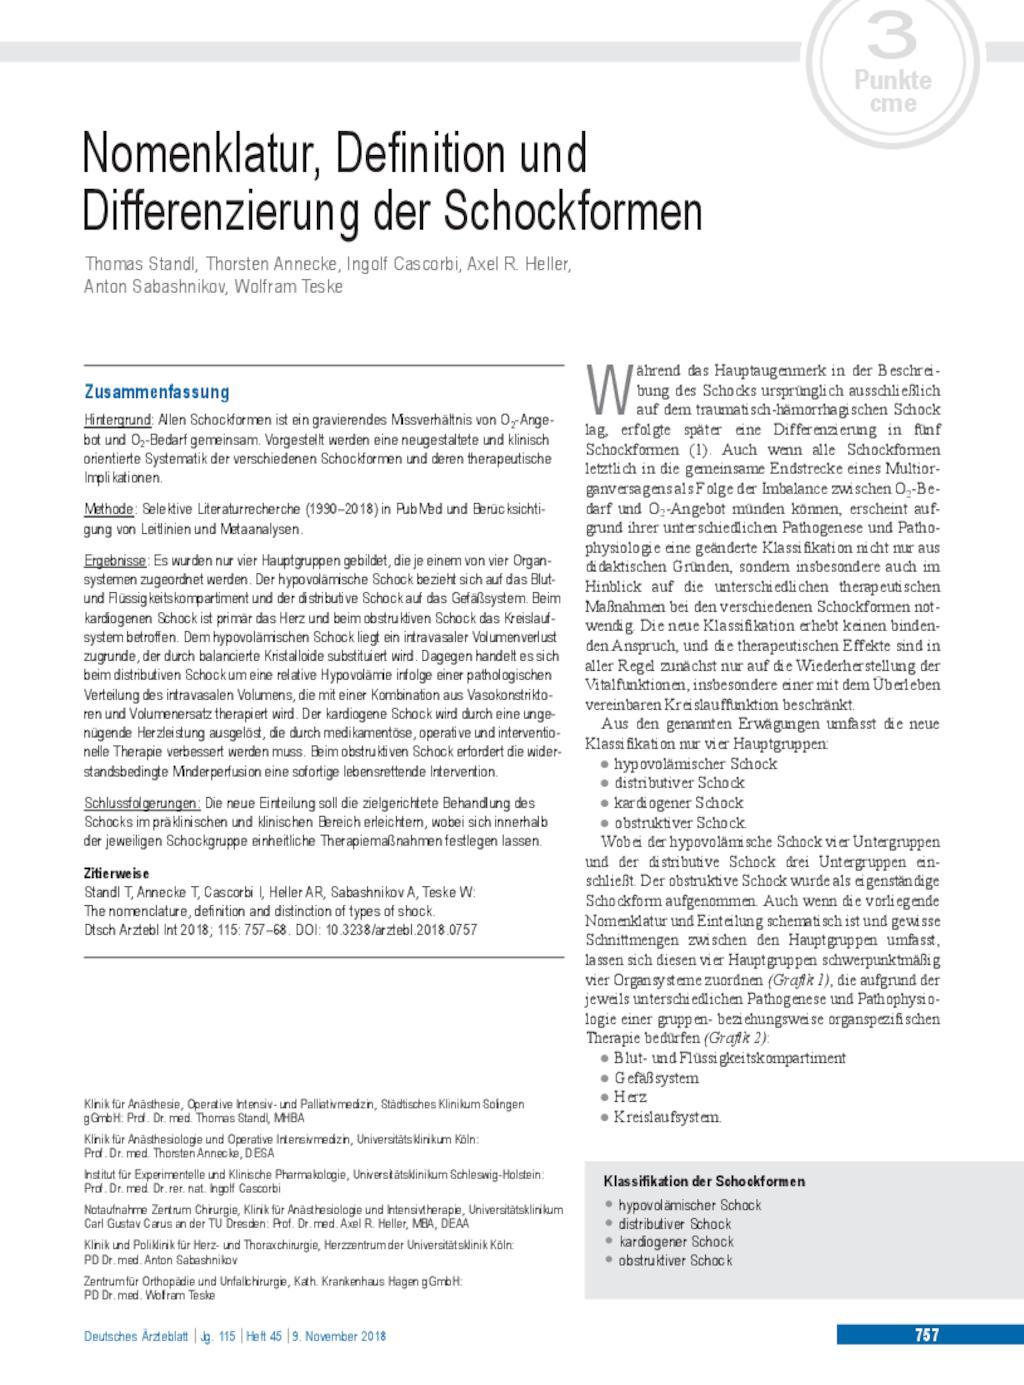 download mathematics education and language: interpreting hermeneutics and post structuralism